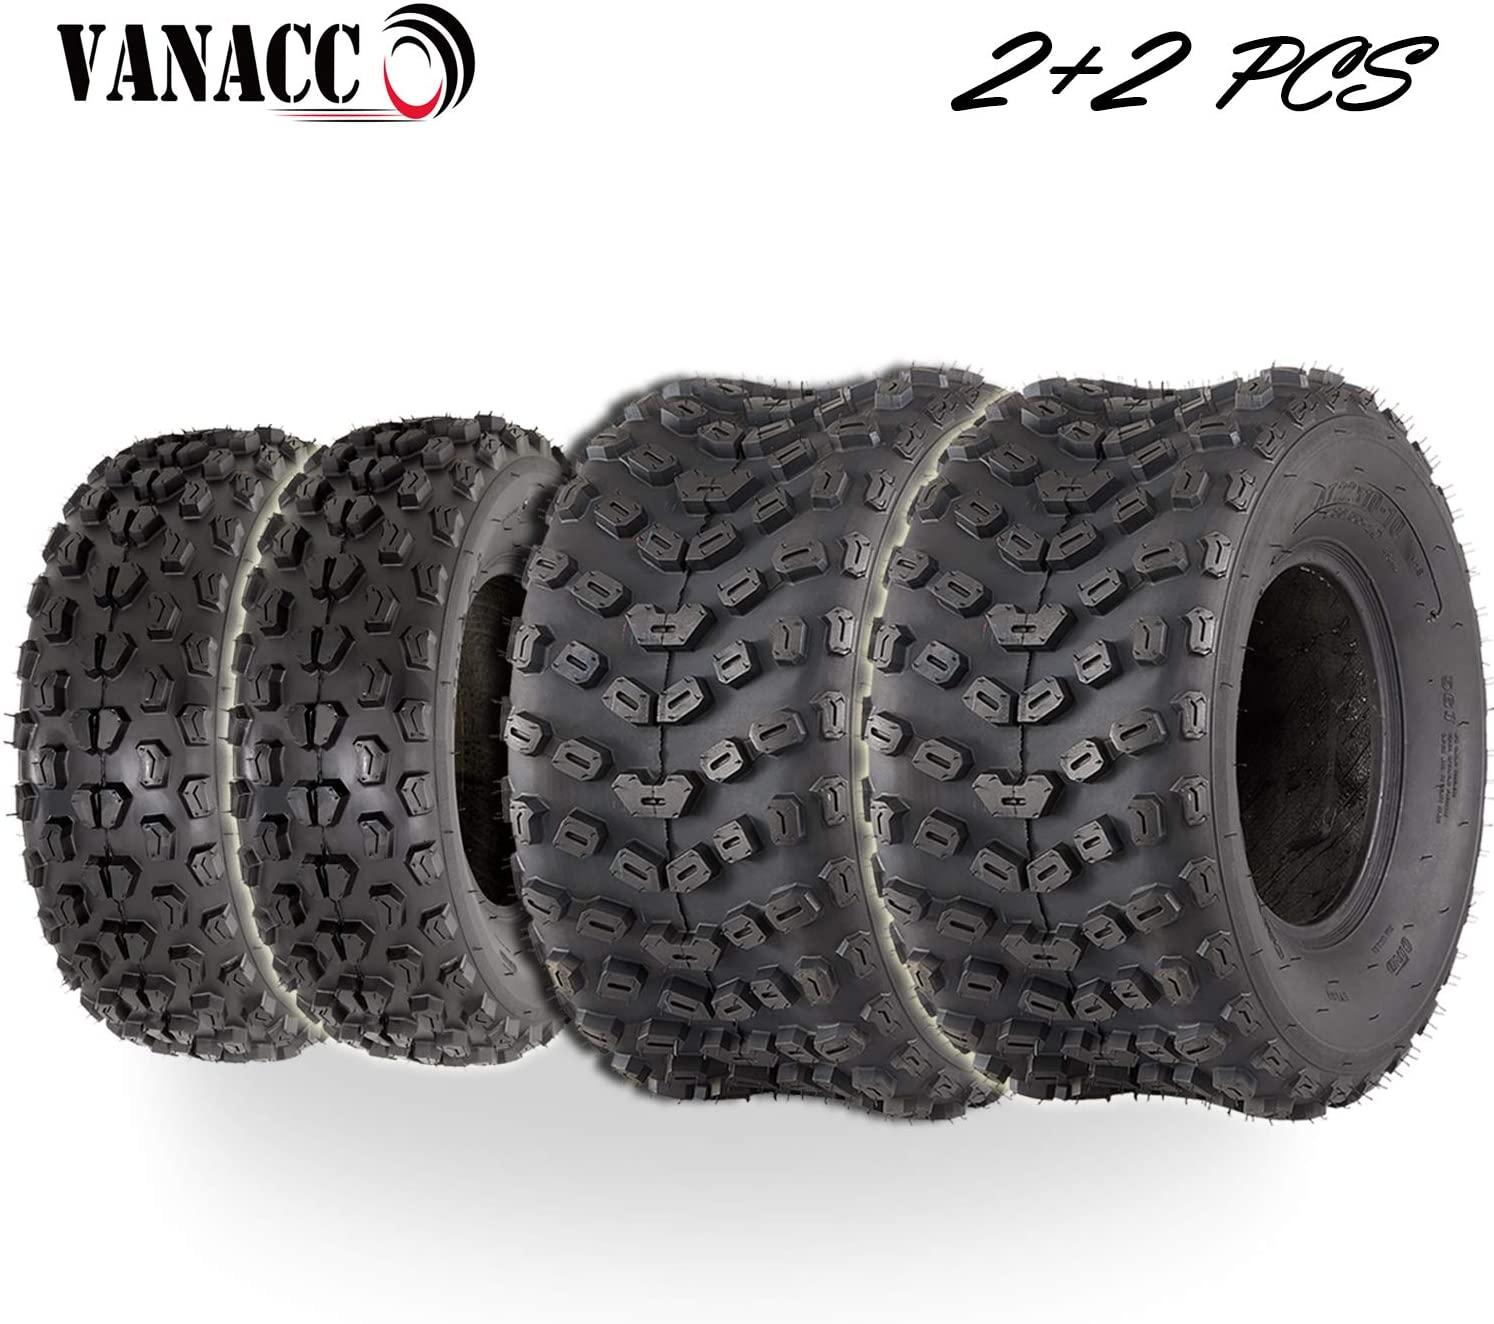 VANACC Set of 4 ATV/UTV Tires 22x7-10 Front 22x10-10 Rear Tubeless 22x7x10 22x10-10